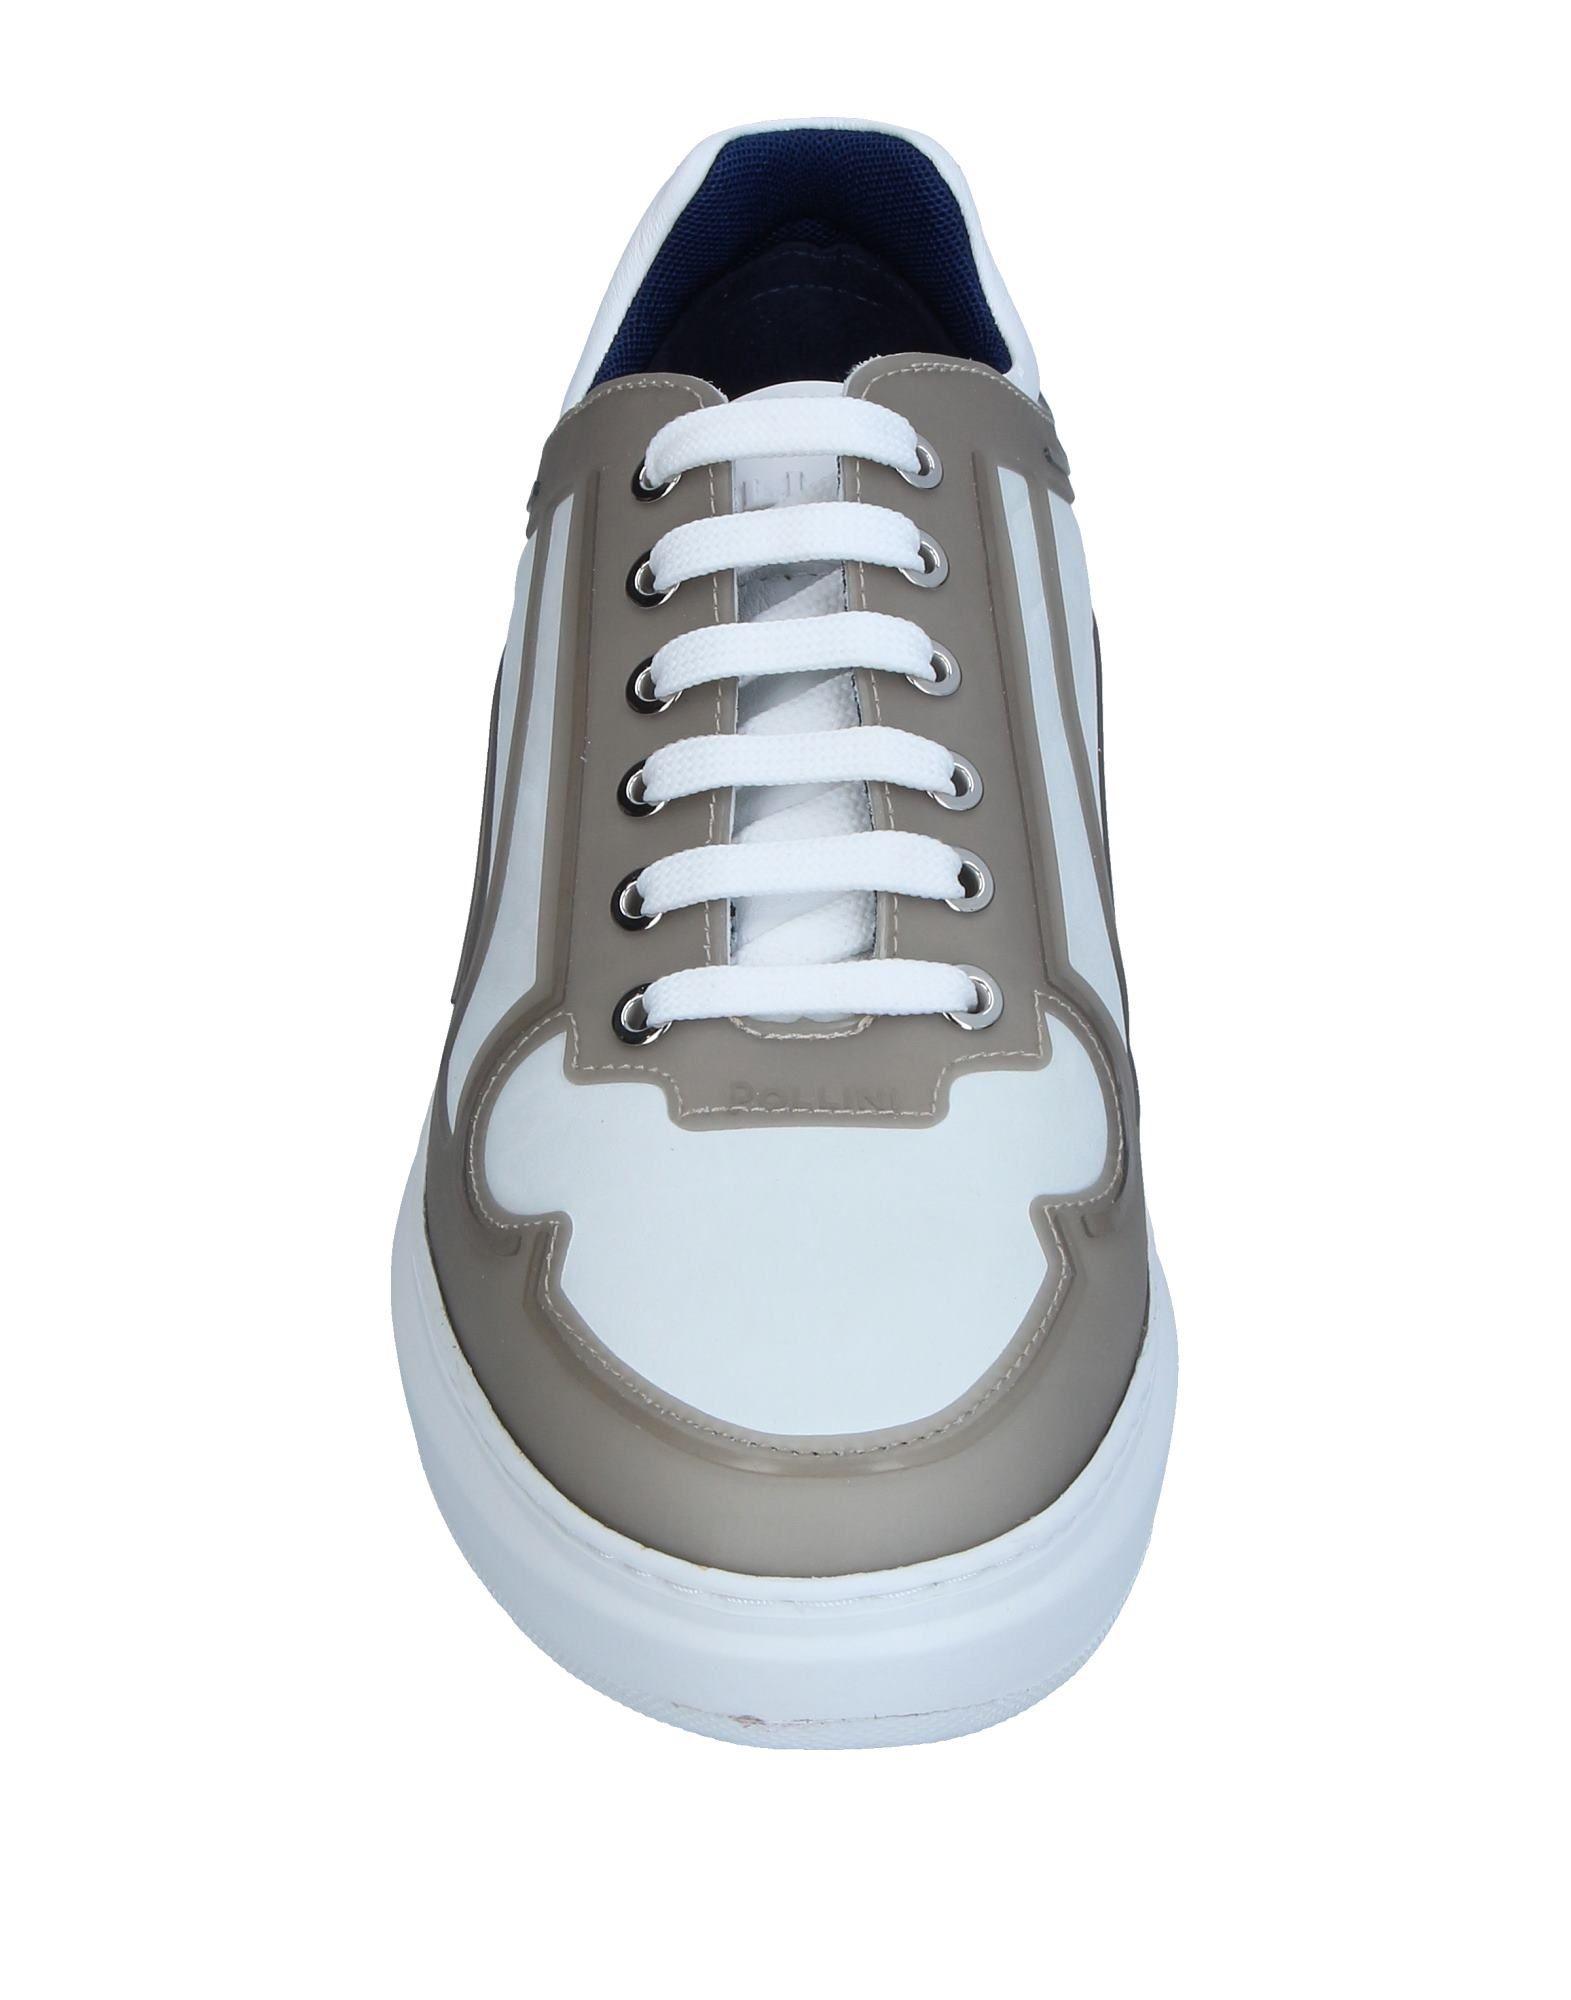 Pollini Sneakers Herren  11331349OO Schuhe Gute Qualität beliebte Schuhe 11331349OO 0dae3b